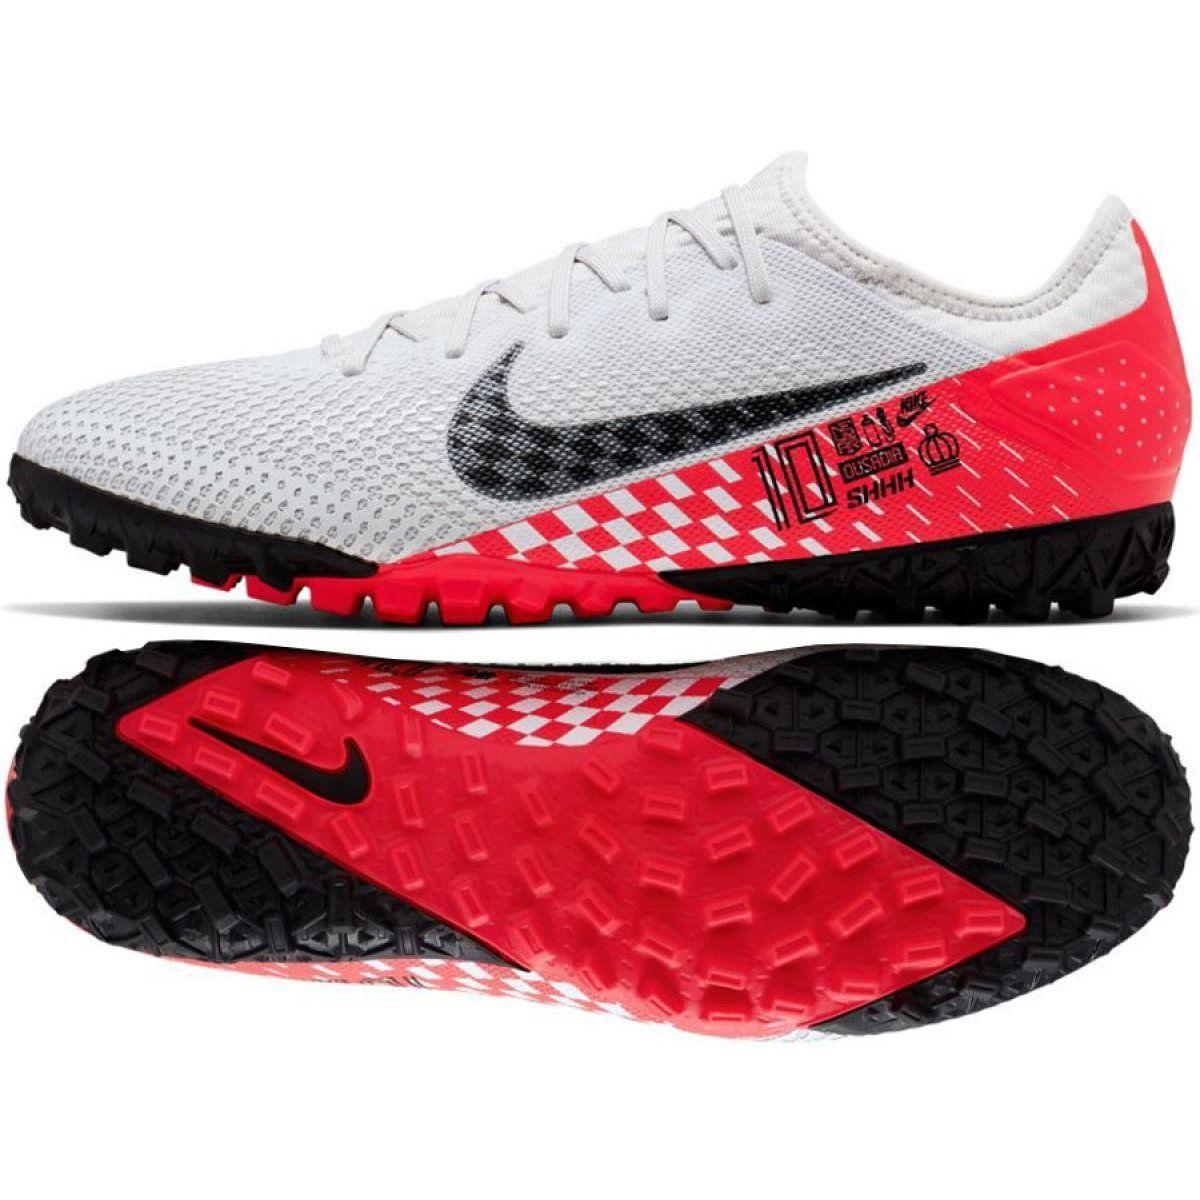 Buty Pilkarskie Nike Mercurial Vapor 13 Pro Tf Neymar M At8003 006 Biale Biale Football Shoes Nike Nike Football